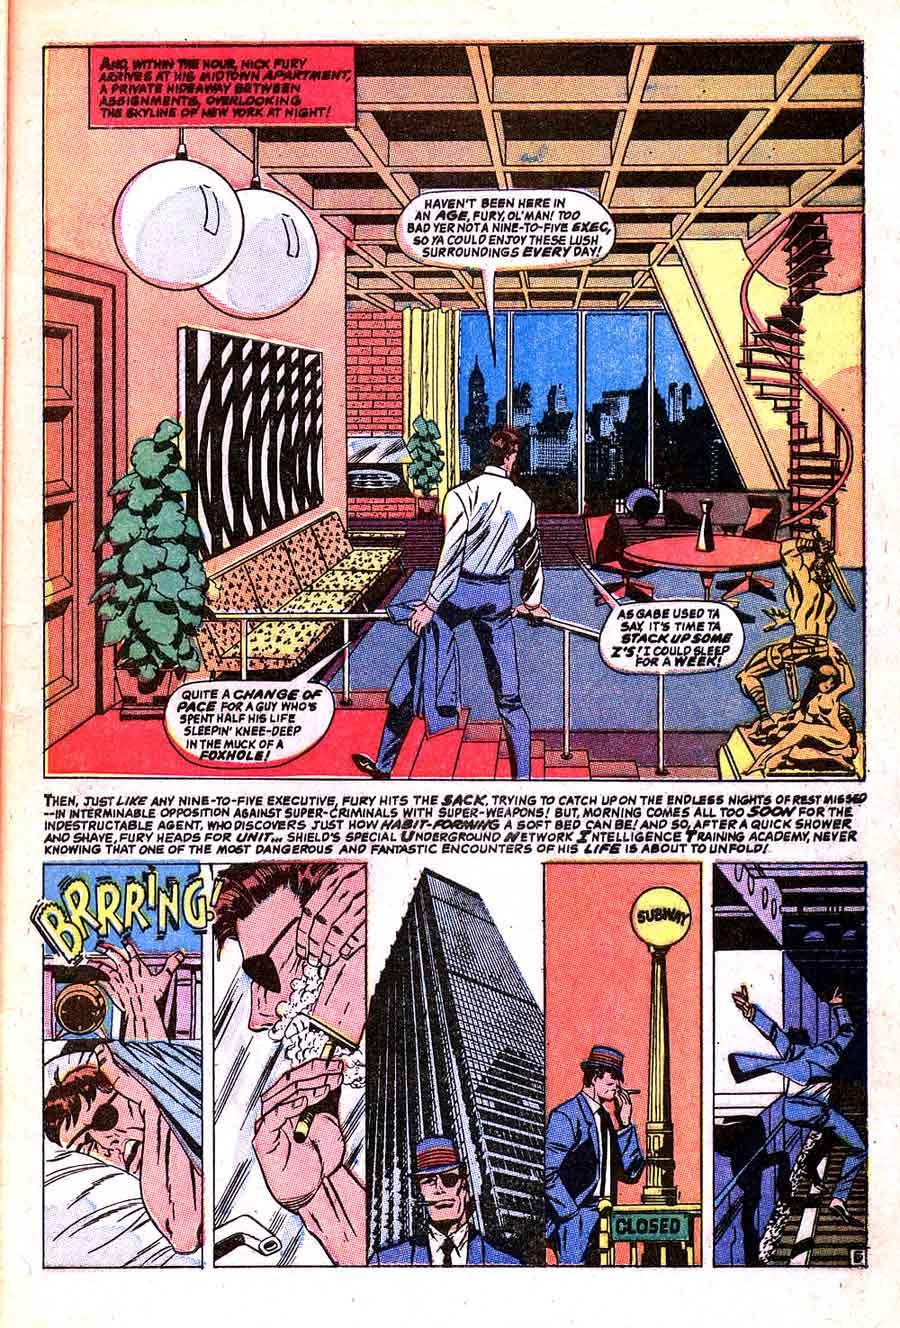 Strange Tales v1 #159 nick fury shield comic book page art by Jim Steranko